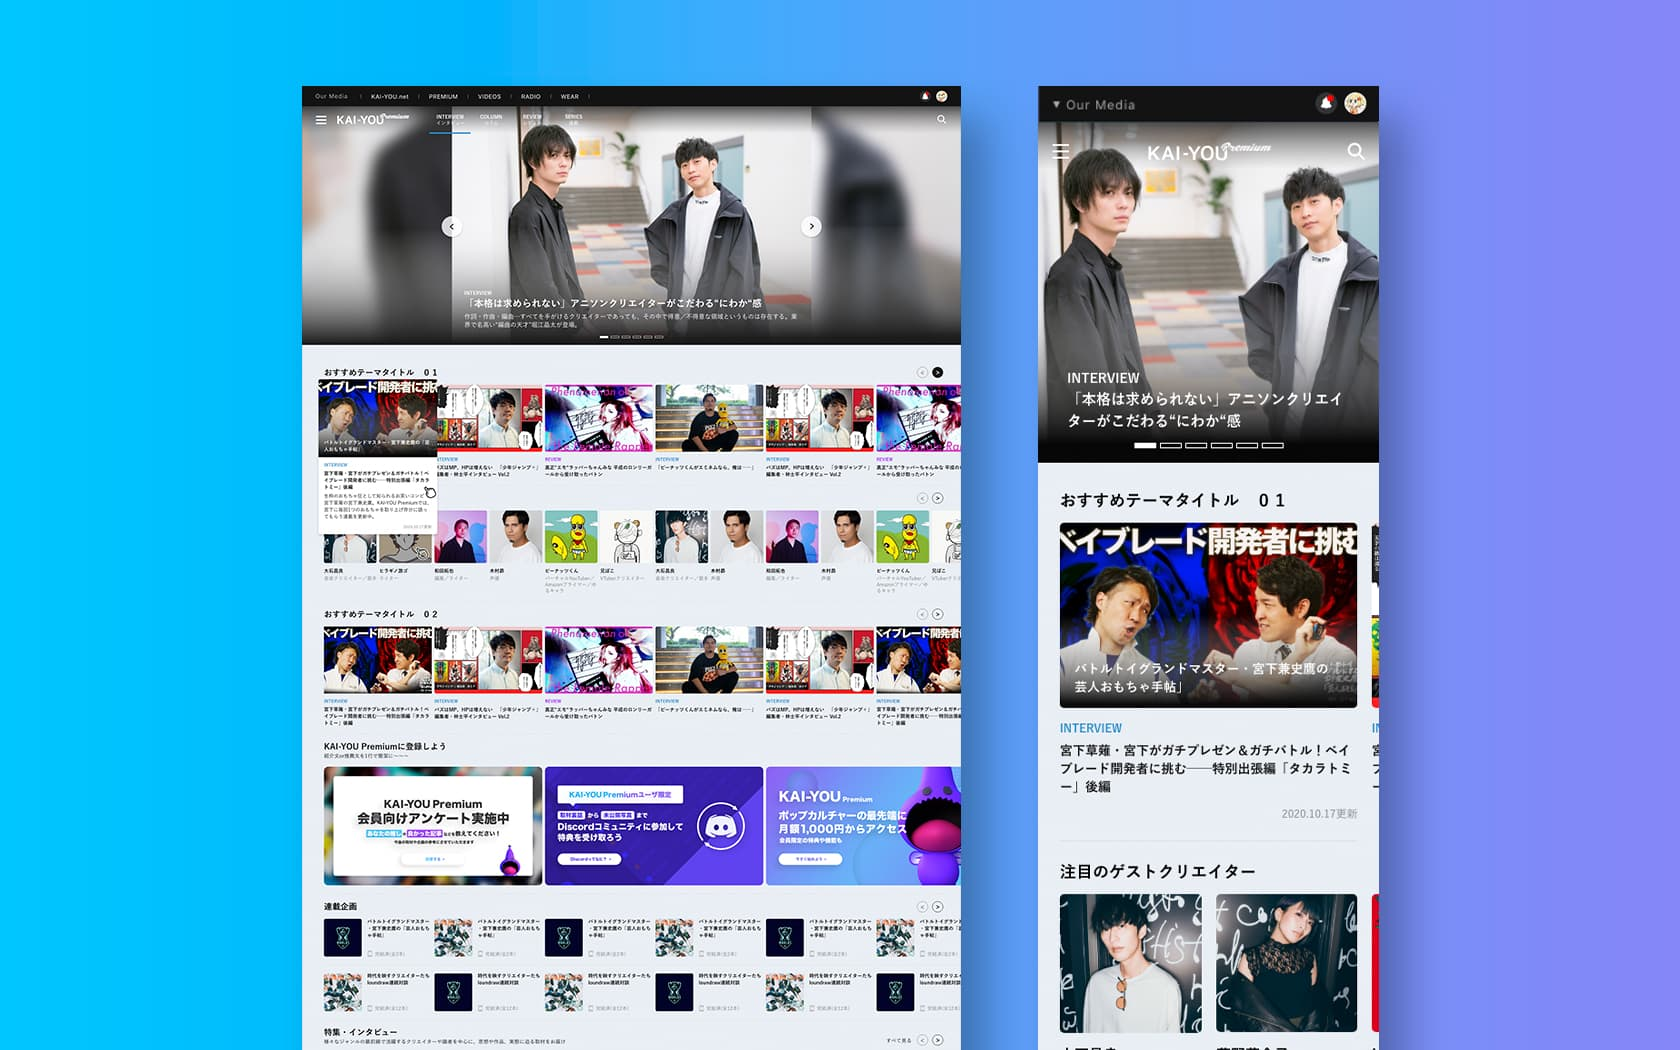 KAI-YOU Premium トップページリニューアルのお知らせ